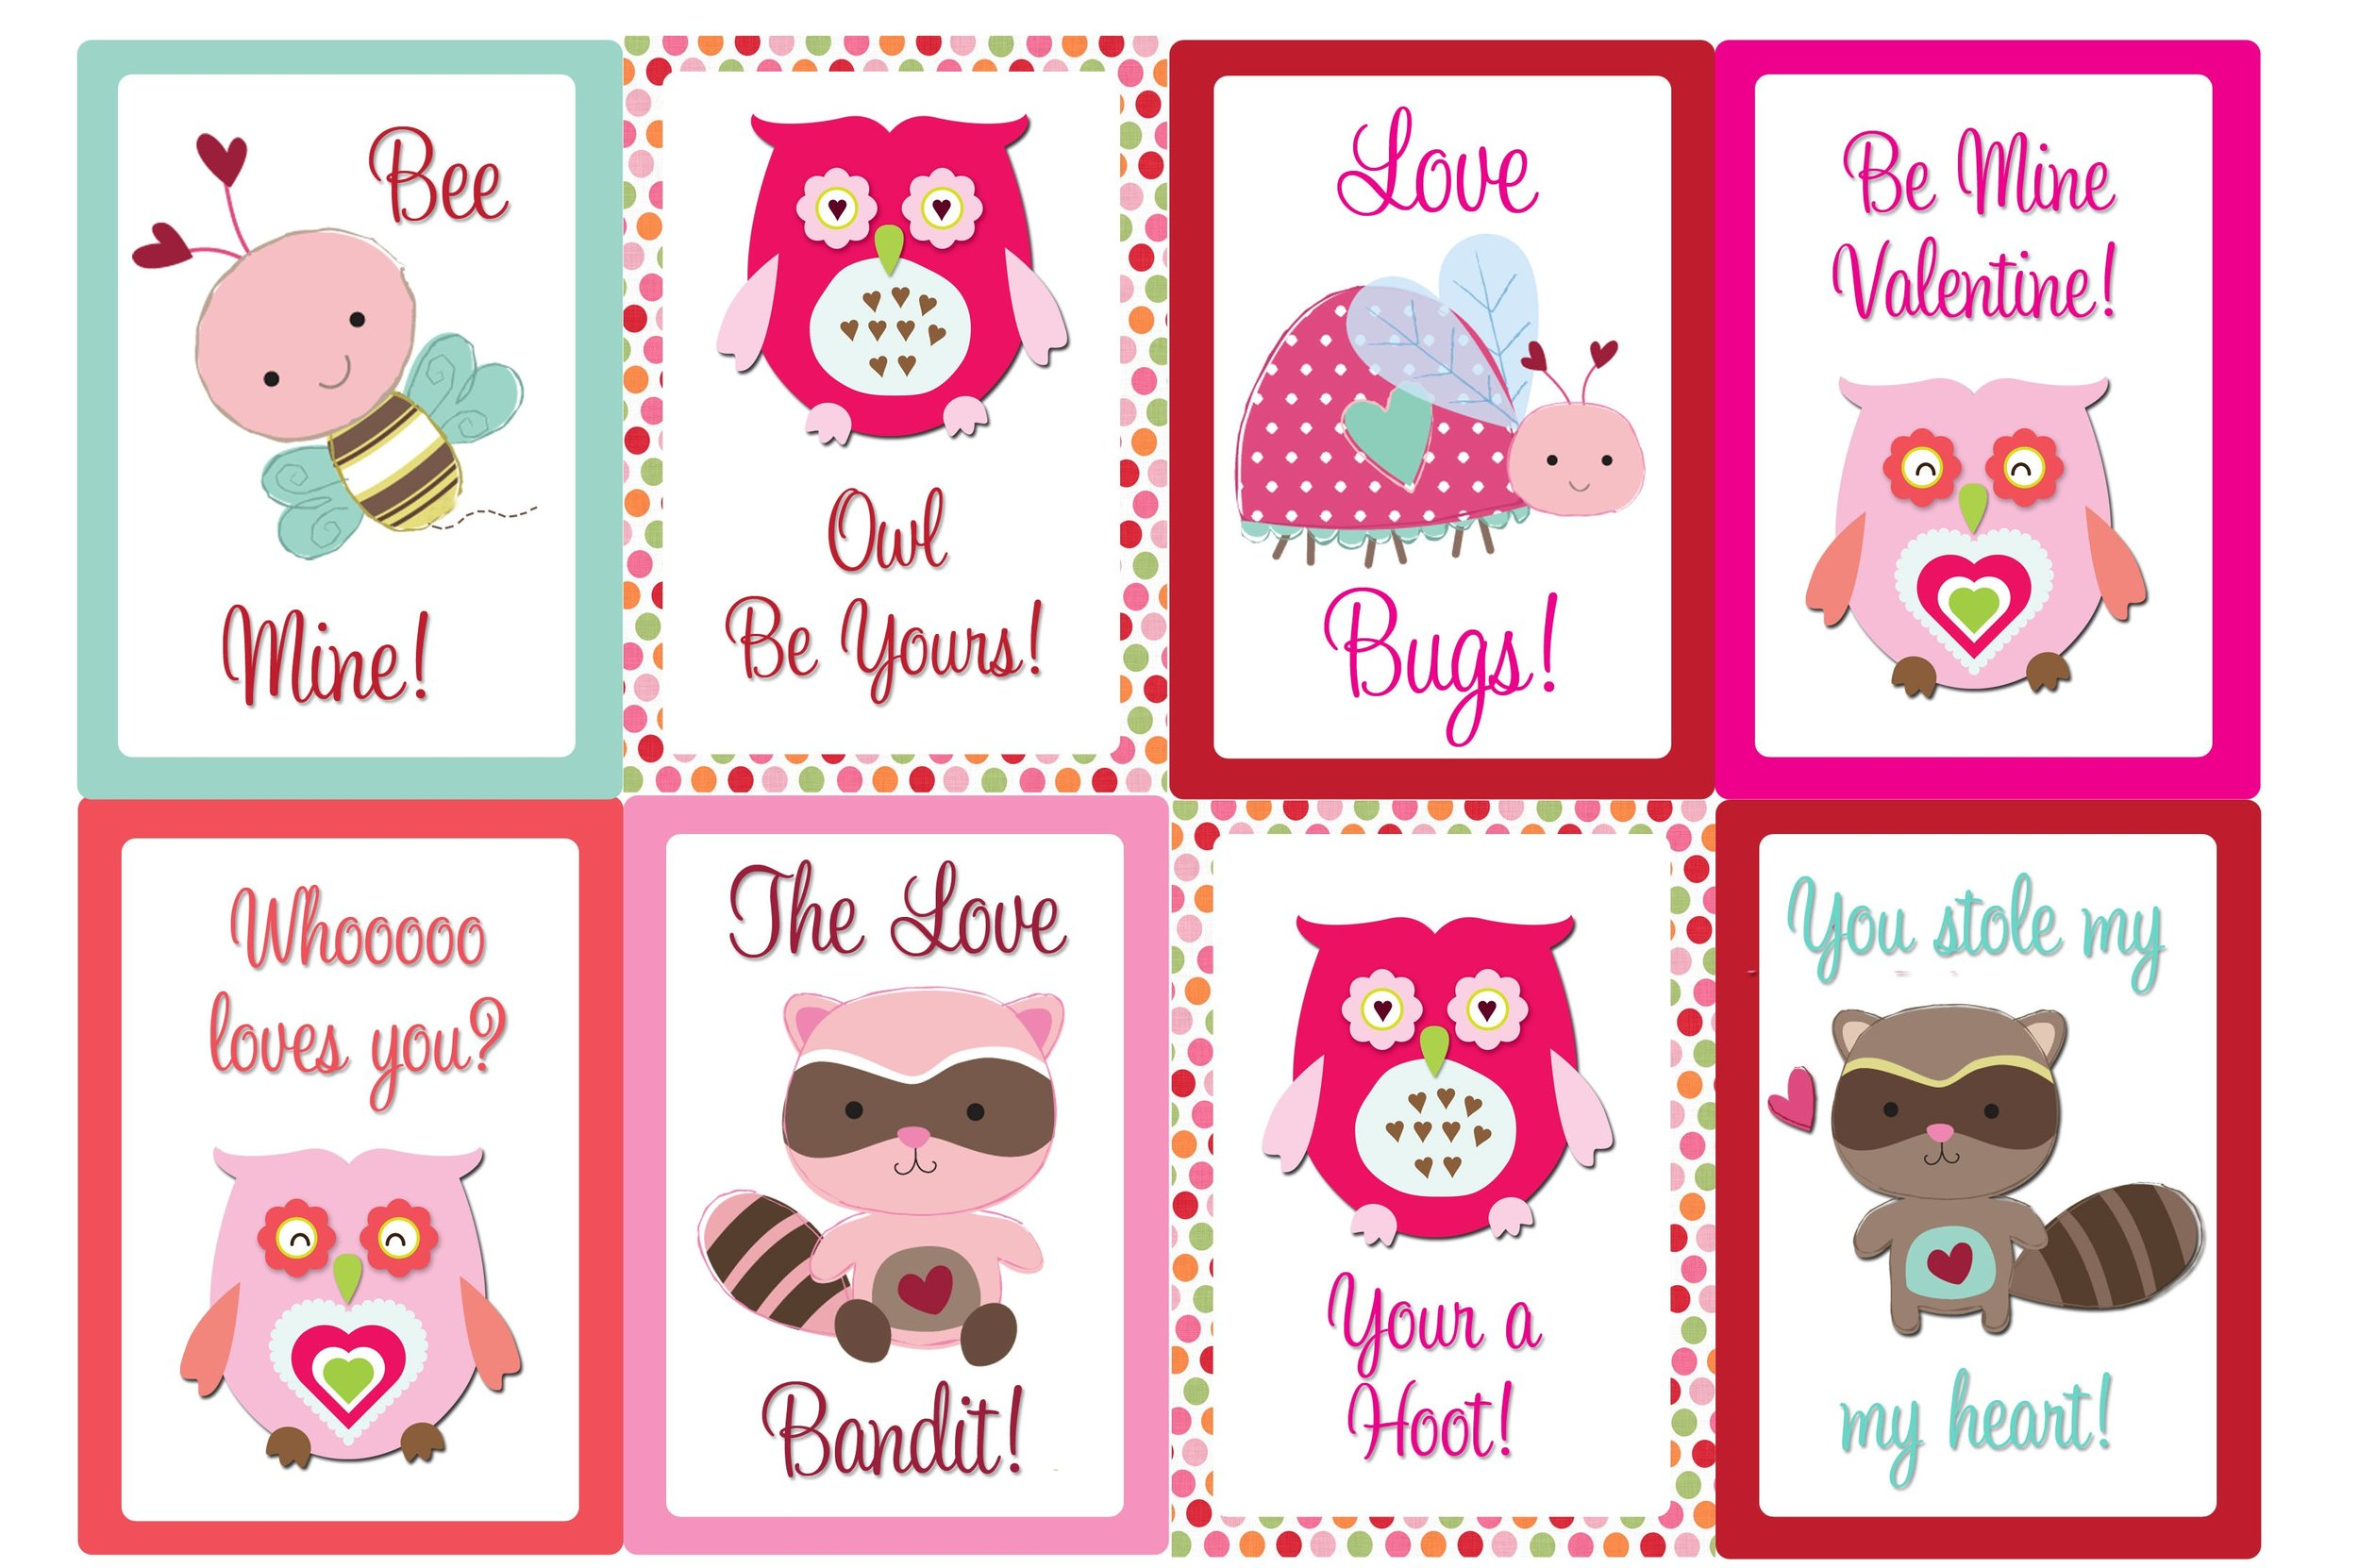 printable_Valentines_Greeting_Cards_and_Handmade_Valentine_Card_Designs-4.jpg